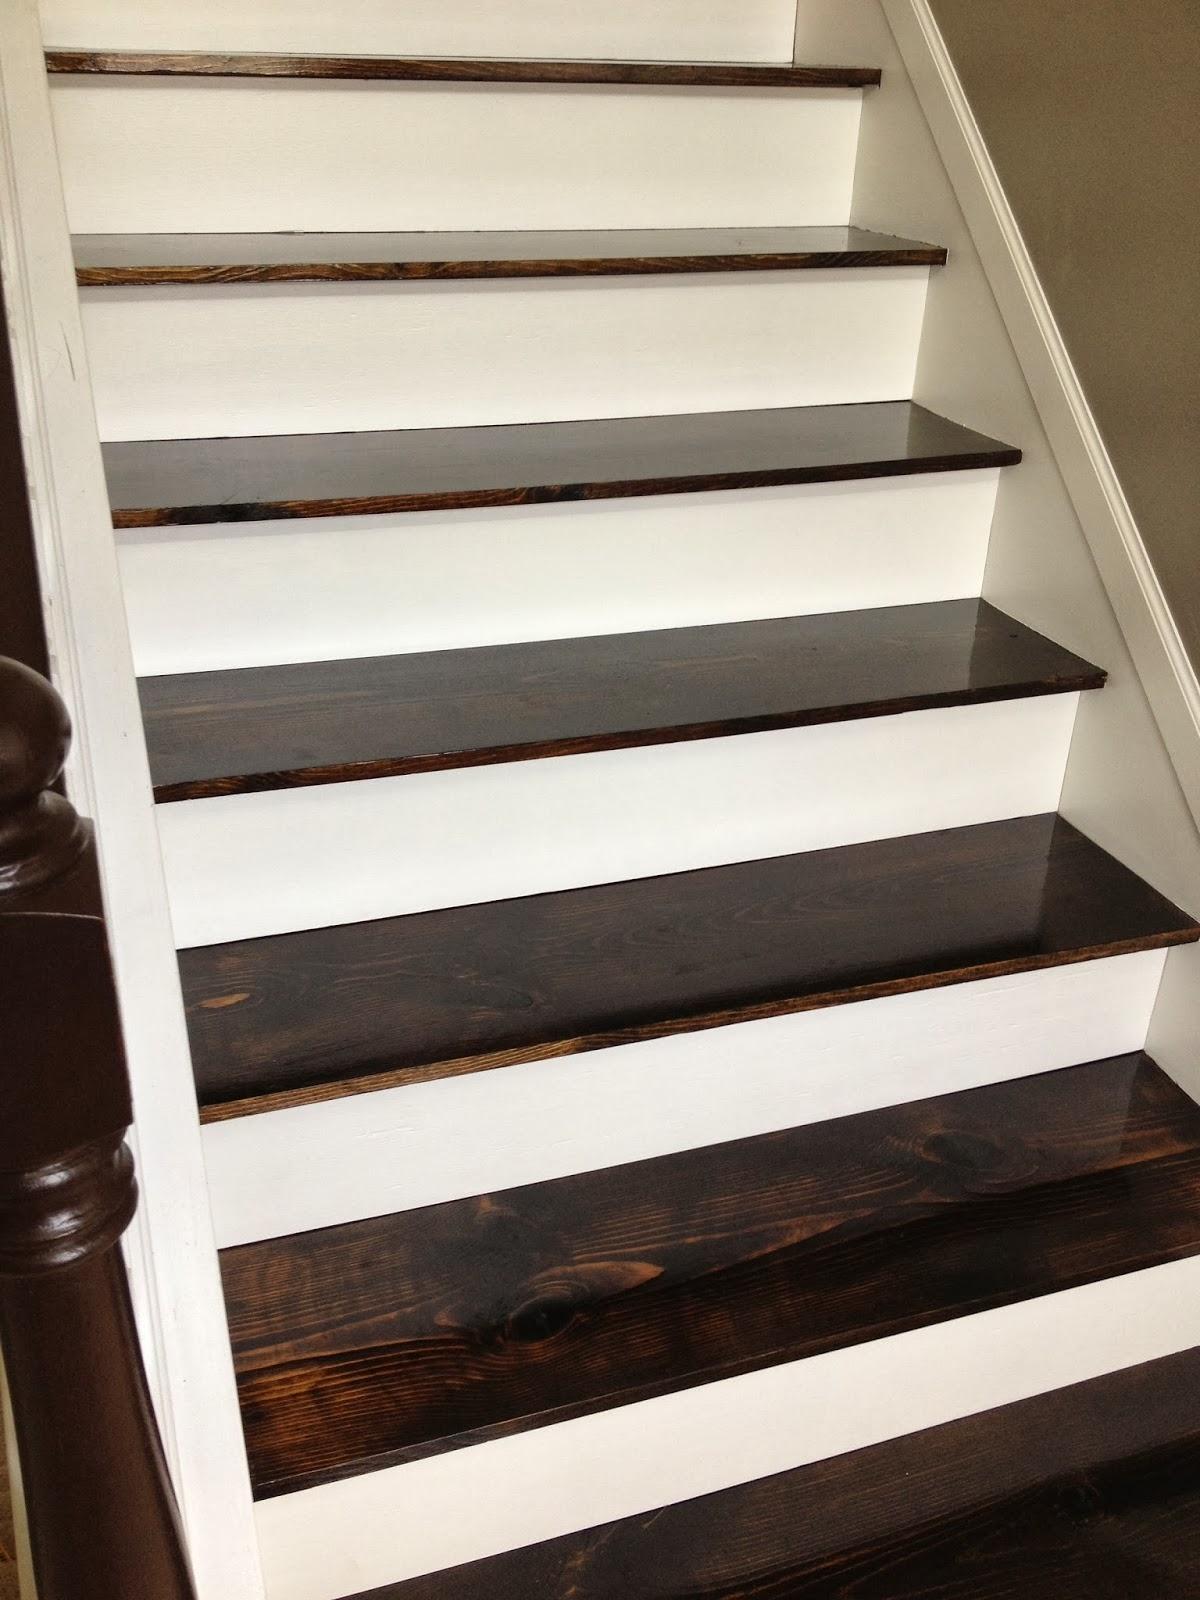 Remodelaholic 60 Carpet To Hardwood Stair Remodel Throughout Diy Stair Tread Rugs (View 10 of 15)